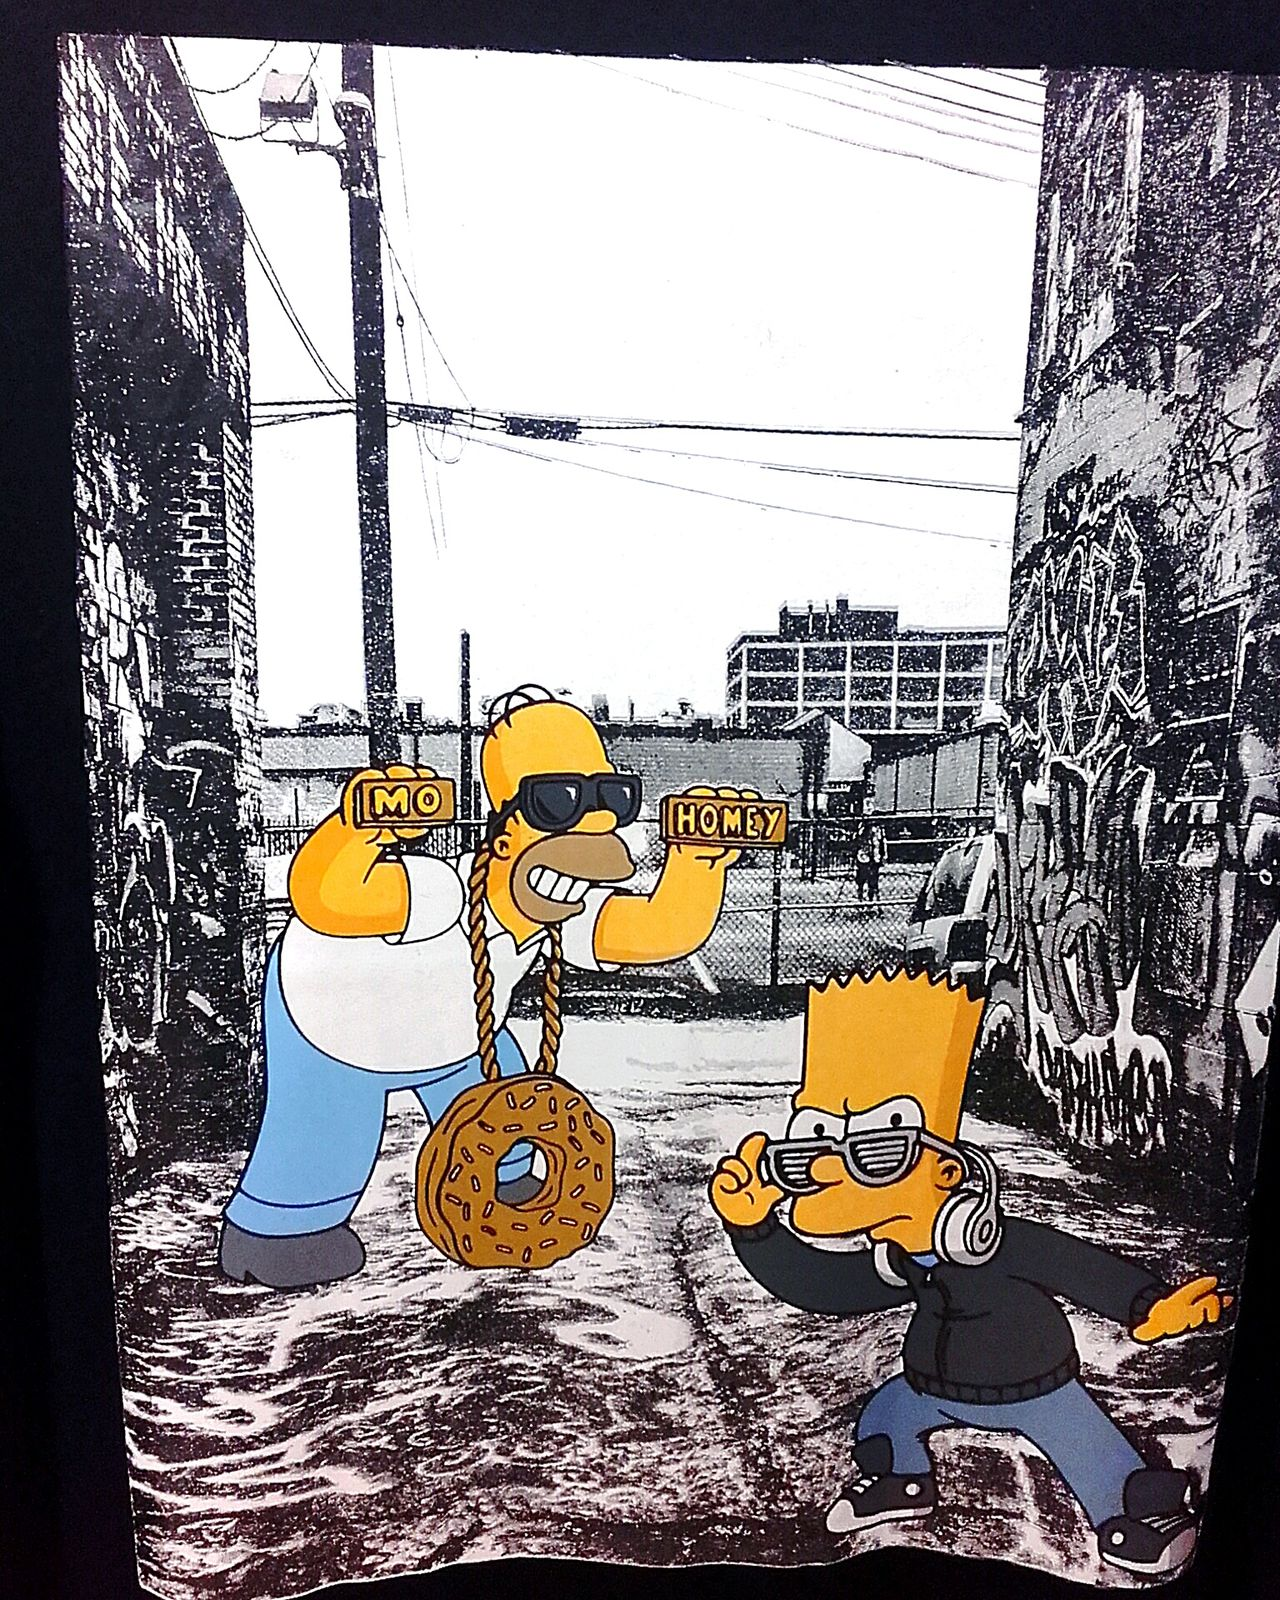 The Simpsons Homey Bartholomew Simpson Tshirts Homer Simpson Bartsimpson Tshirt Homersimpson Bart Simpson T Shirt The Simpsons Bart T Shirt Collection Tshirt♡ T Shirts Tshirtcollection TheSimpsons BartholomewSimpson Tshirtart T Shirt Art Tees Teeshirt Bart And Homer Bart & Homer Simpsons Bartporn